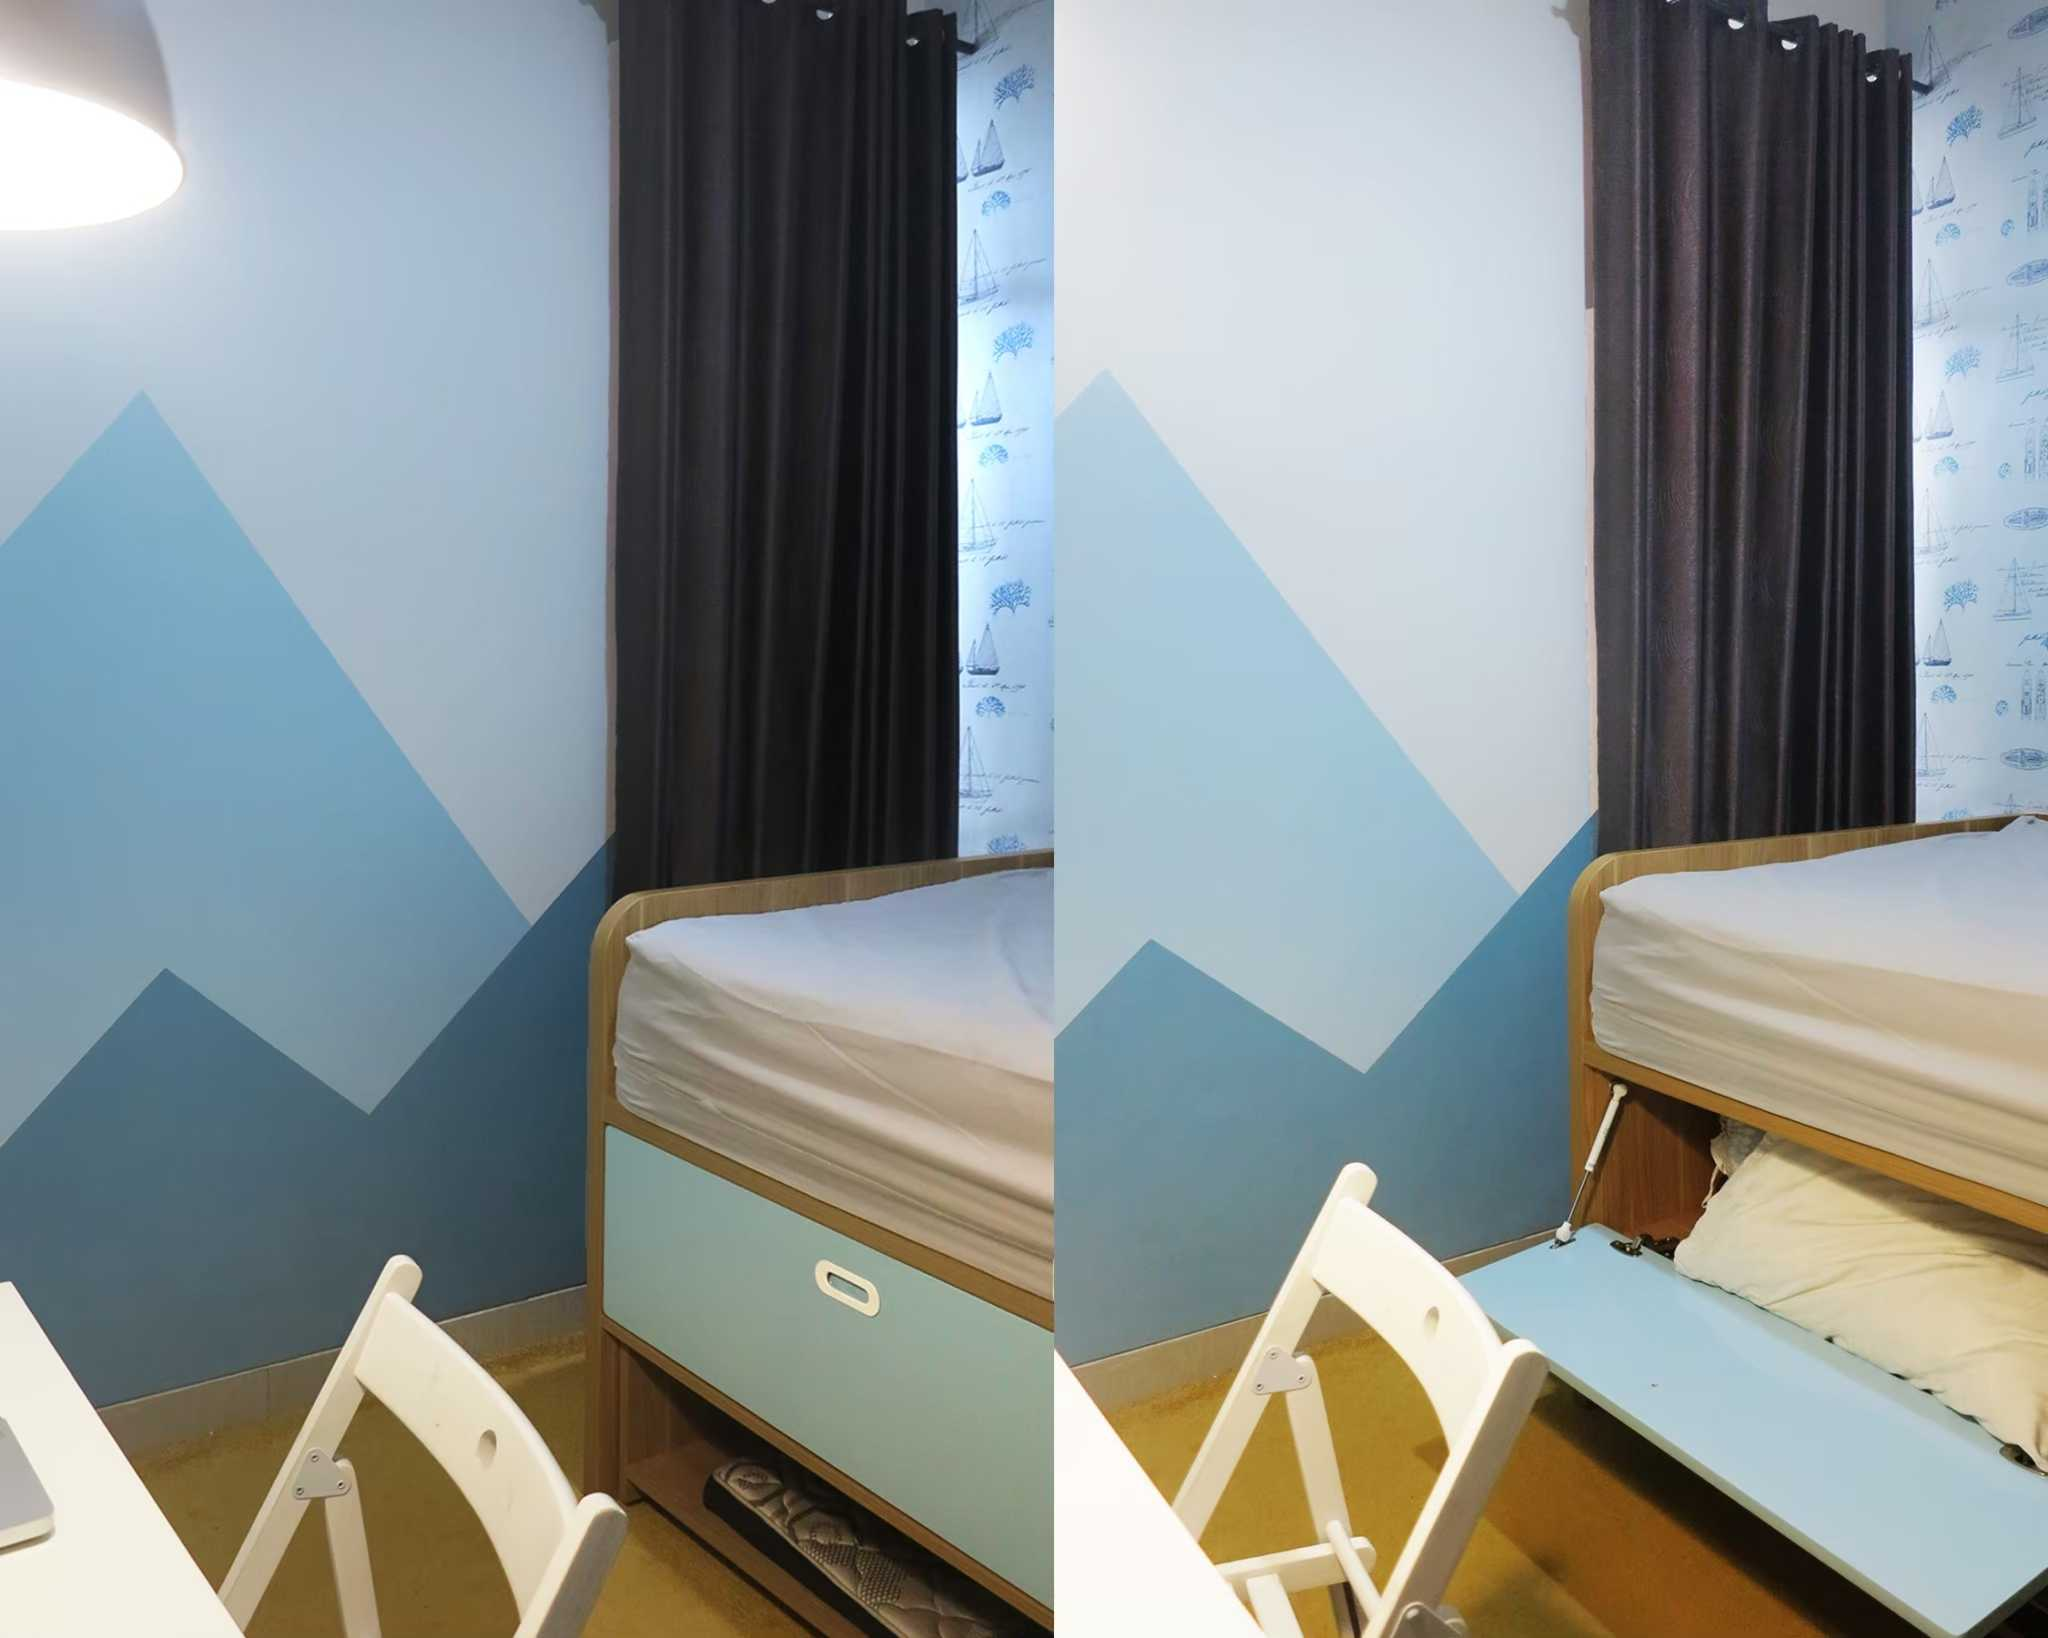 9596 Design Studio Bsd Kids Bedroom Lengkong Kulon, Kec. Pagedangan, Tangerang, Banten 15331, Indonesia Sinar Mas Land Plaza Jl. Grand Boulevard Bsd City, Sampora, Kec. Cisauk, Tangerang, Banten 15345, Indonesia 9596-Design-Studio-Bsd-Kids-Bedroom   122555